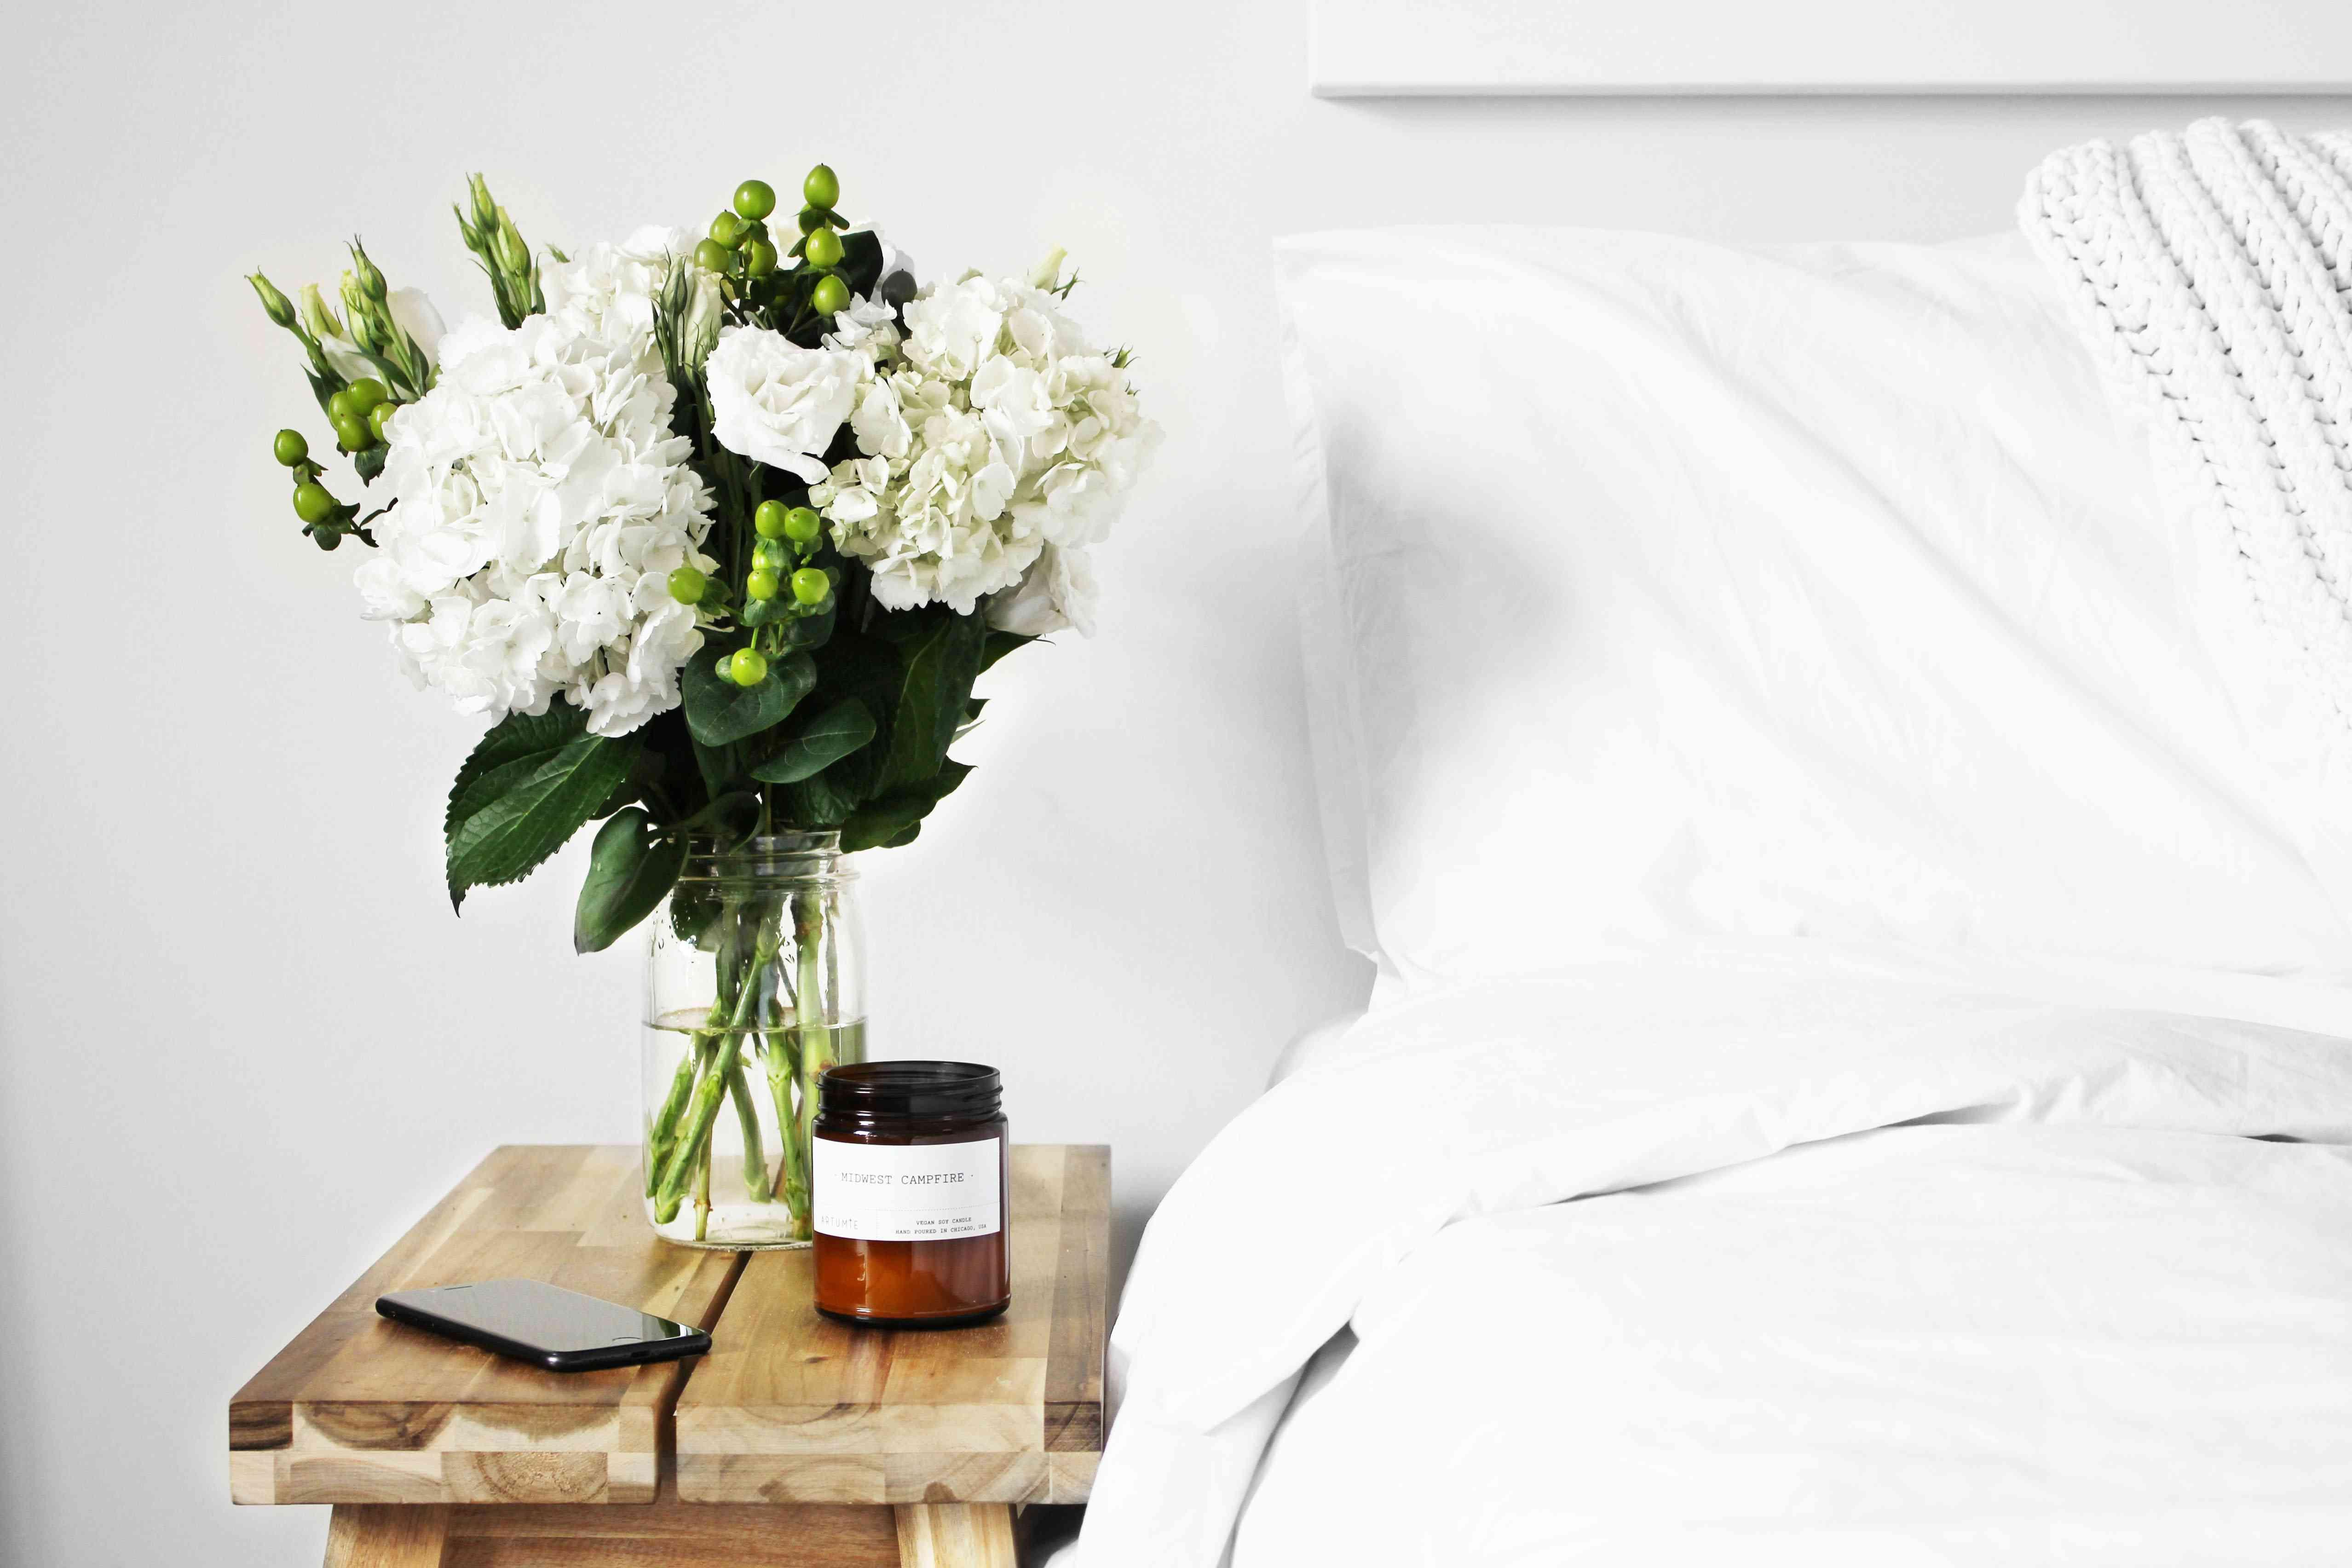 Flower bouquet on a bedside table